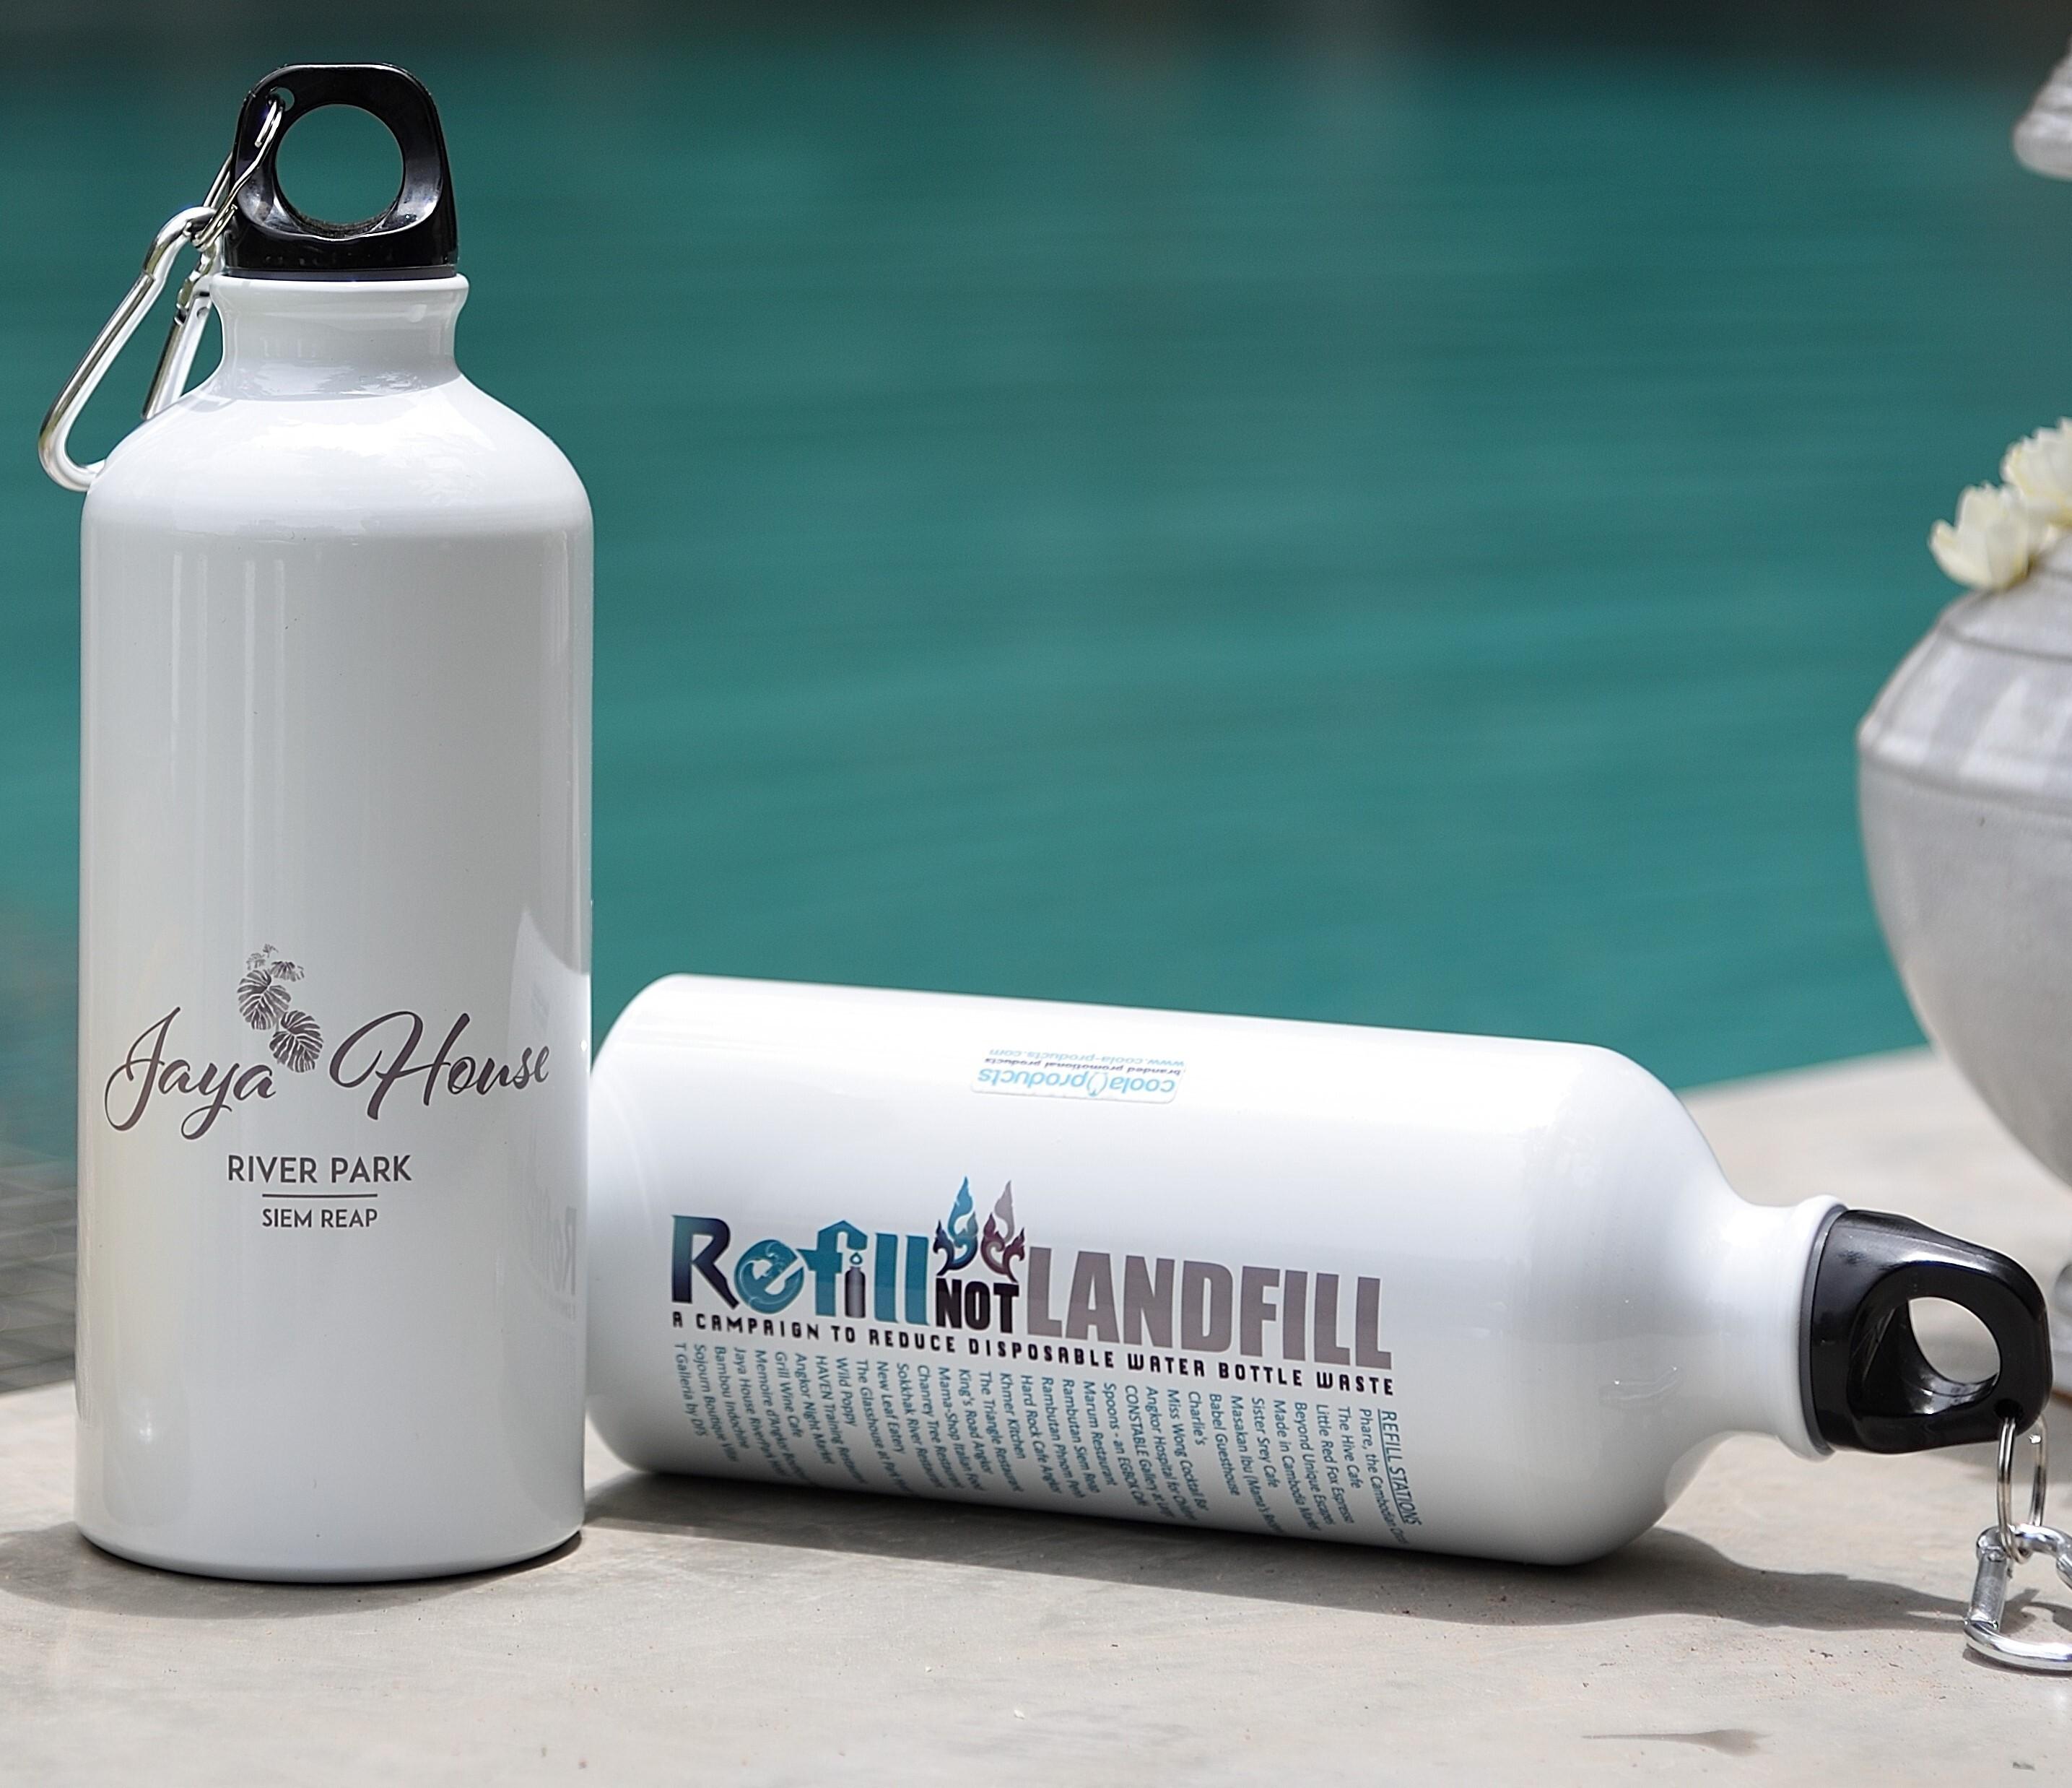 Jaya House Plastic Free Refill Bottles